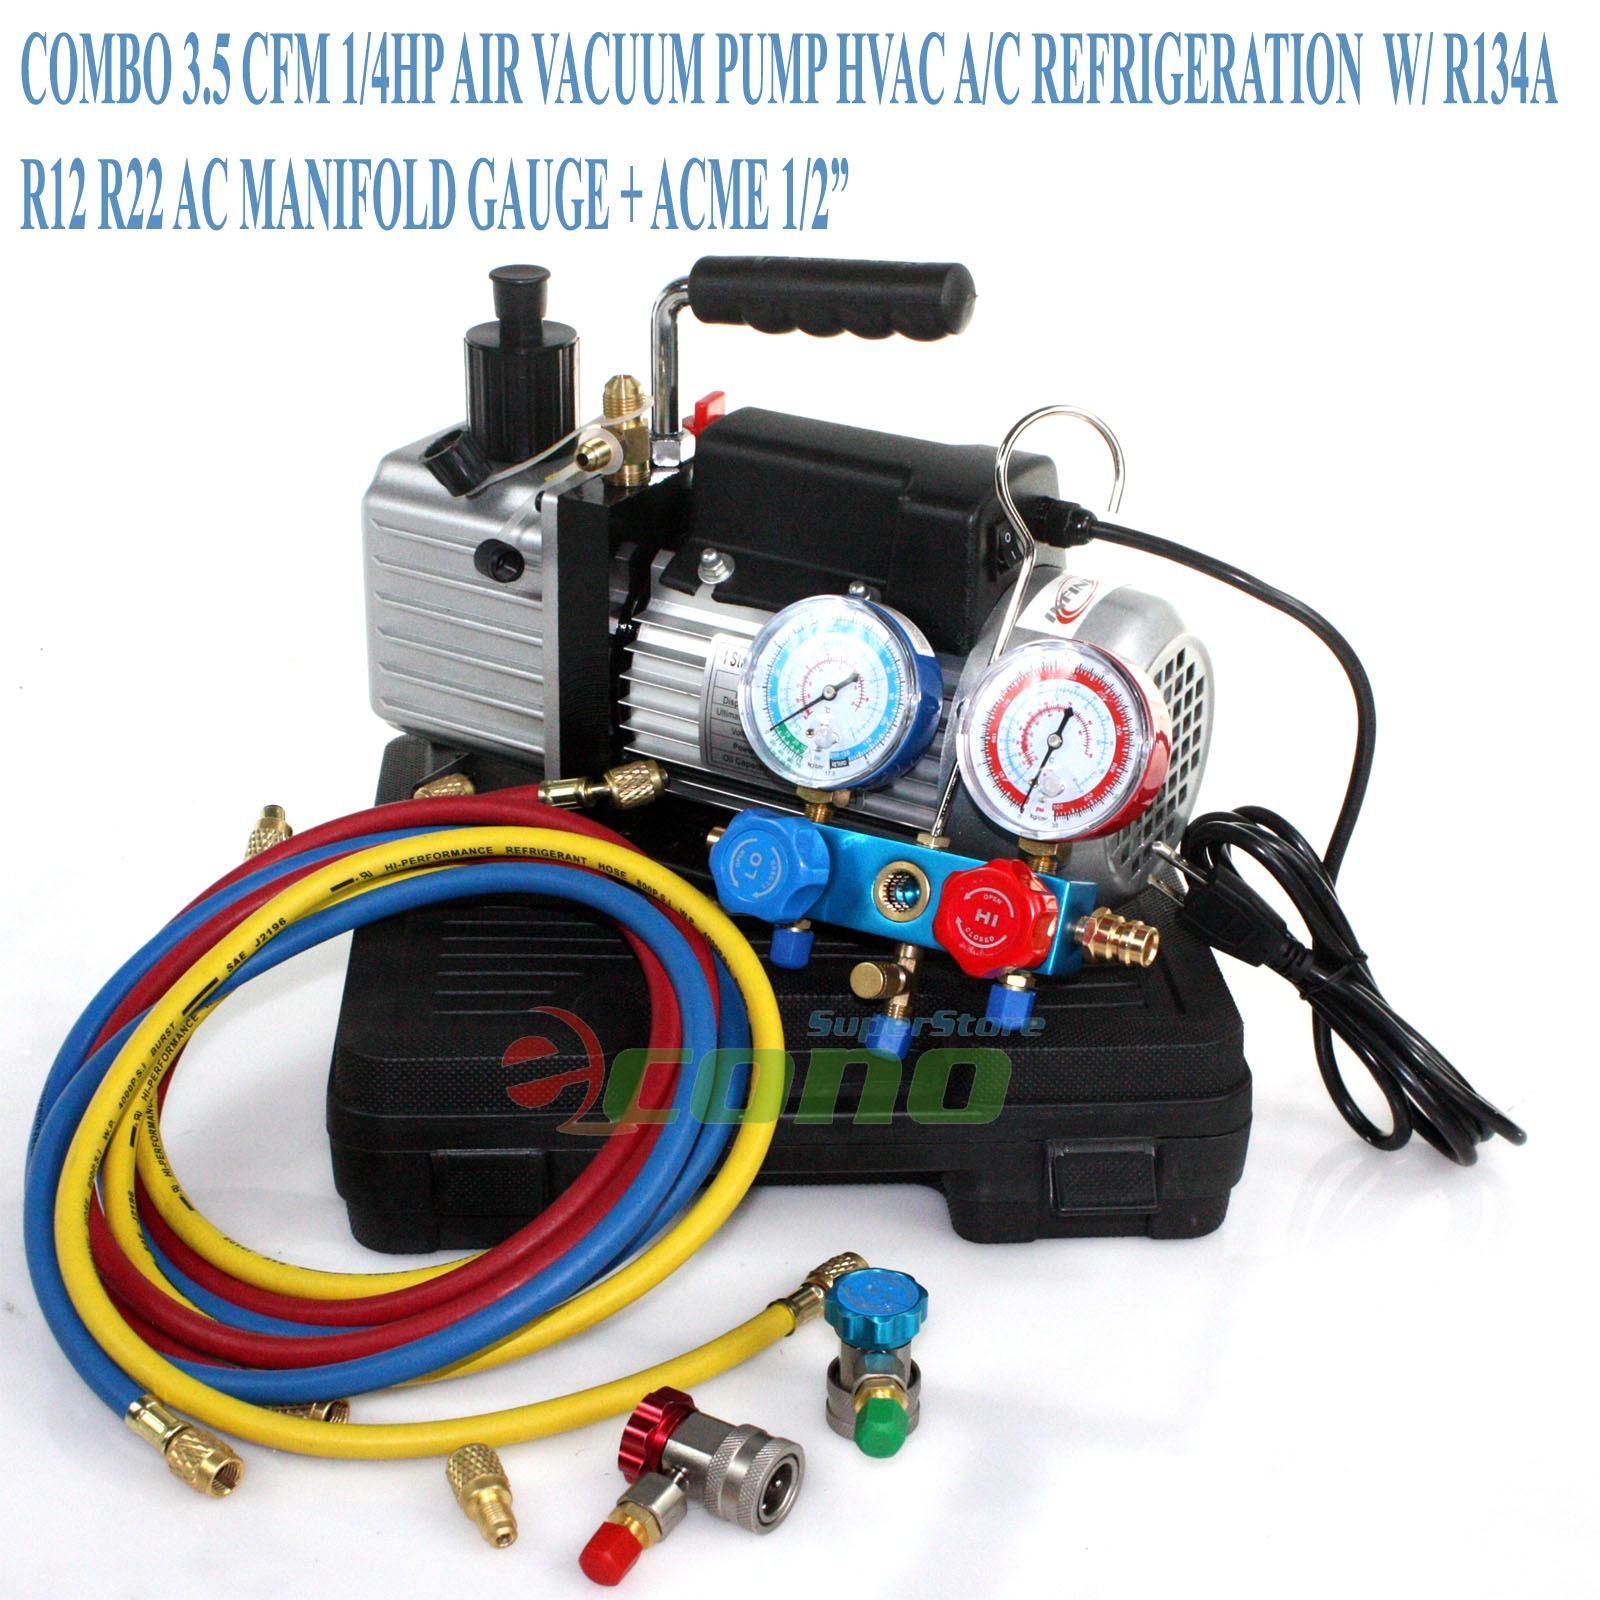 Combo 3 5CFM 1 4HP Air Vacuum Pump HVAC A C Refrigeration Kit AC Manifold Gauge